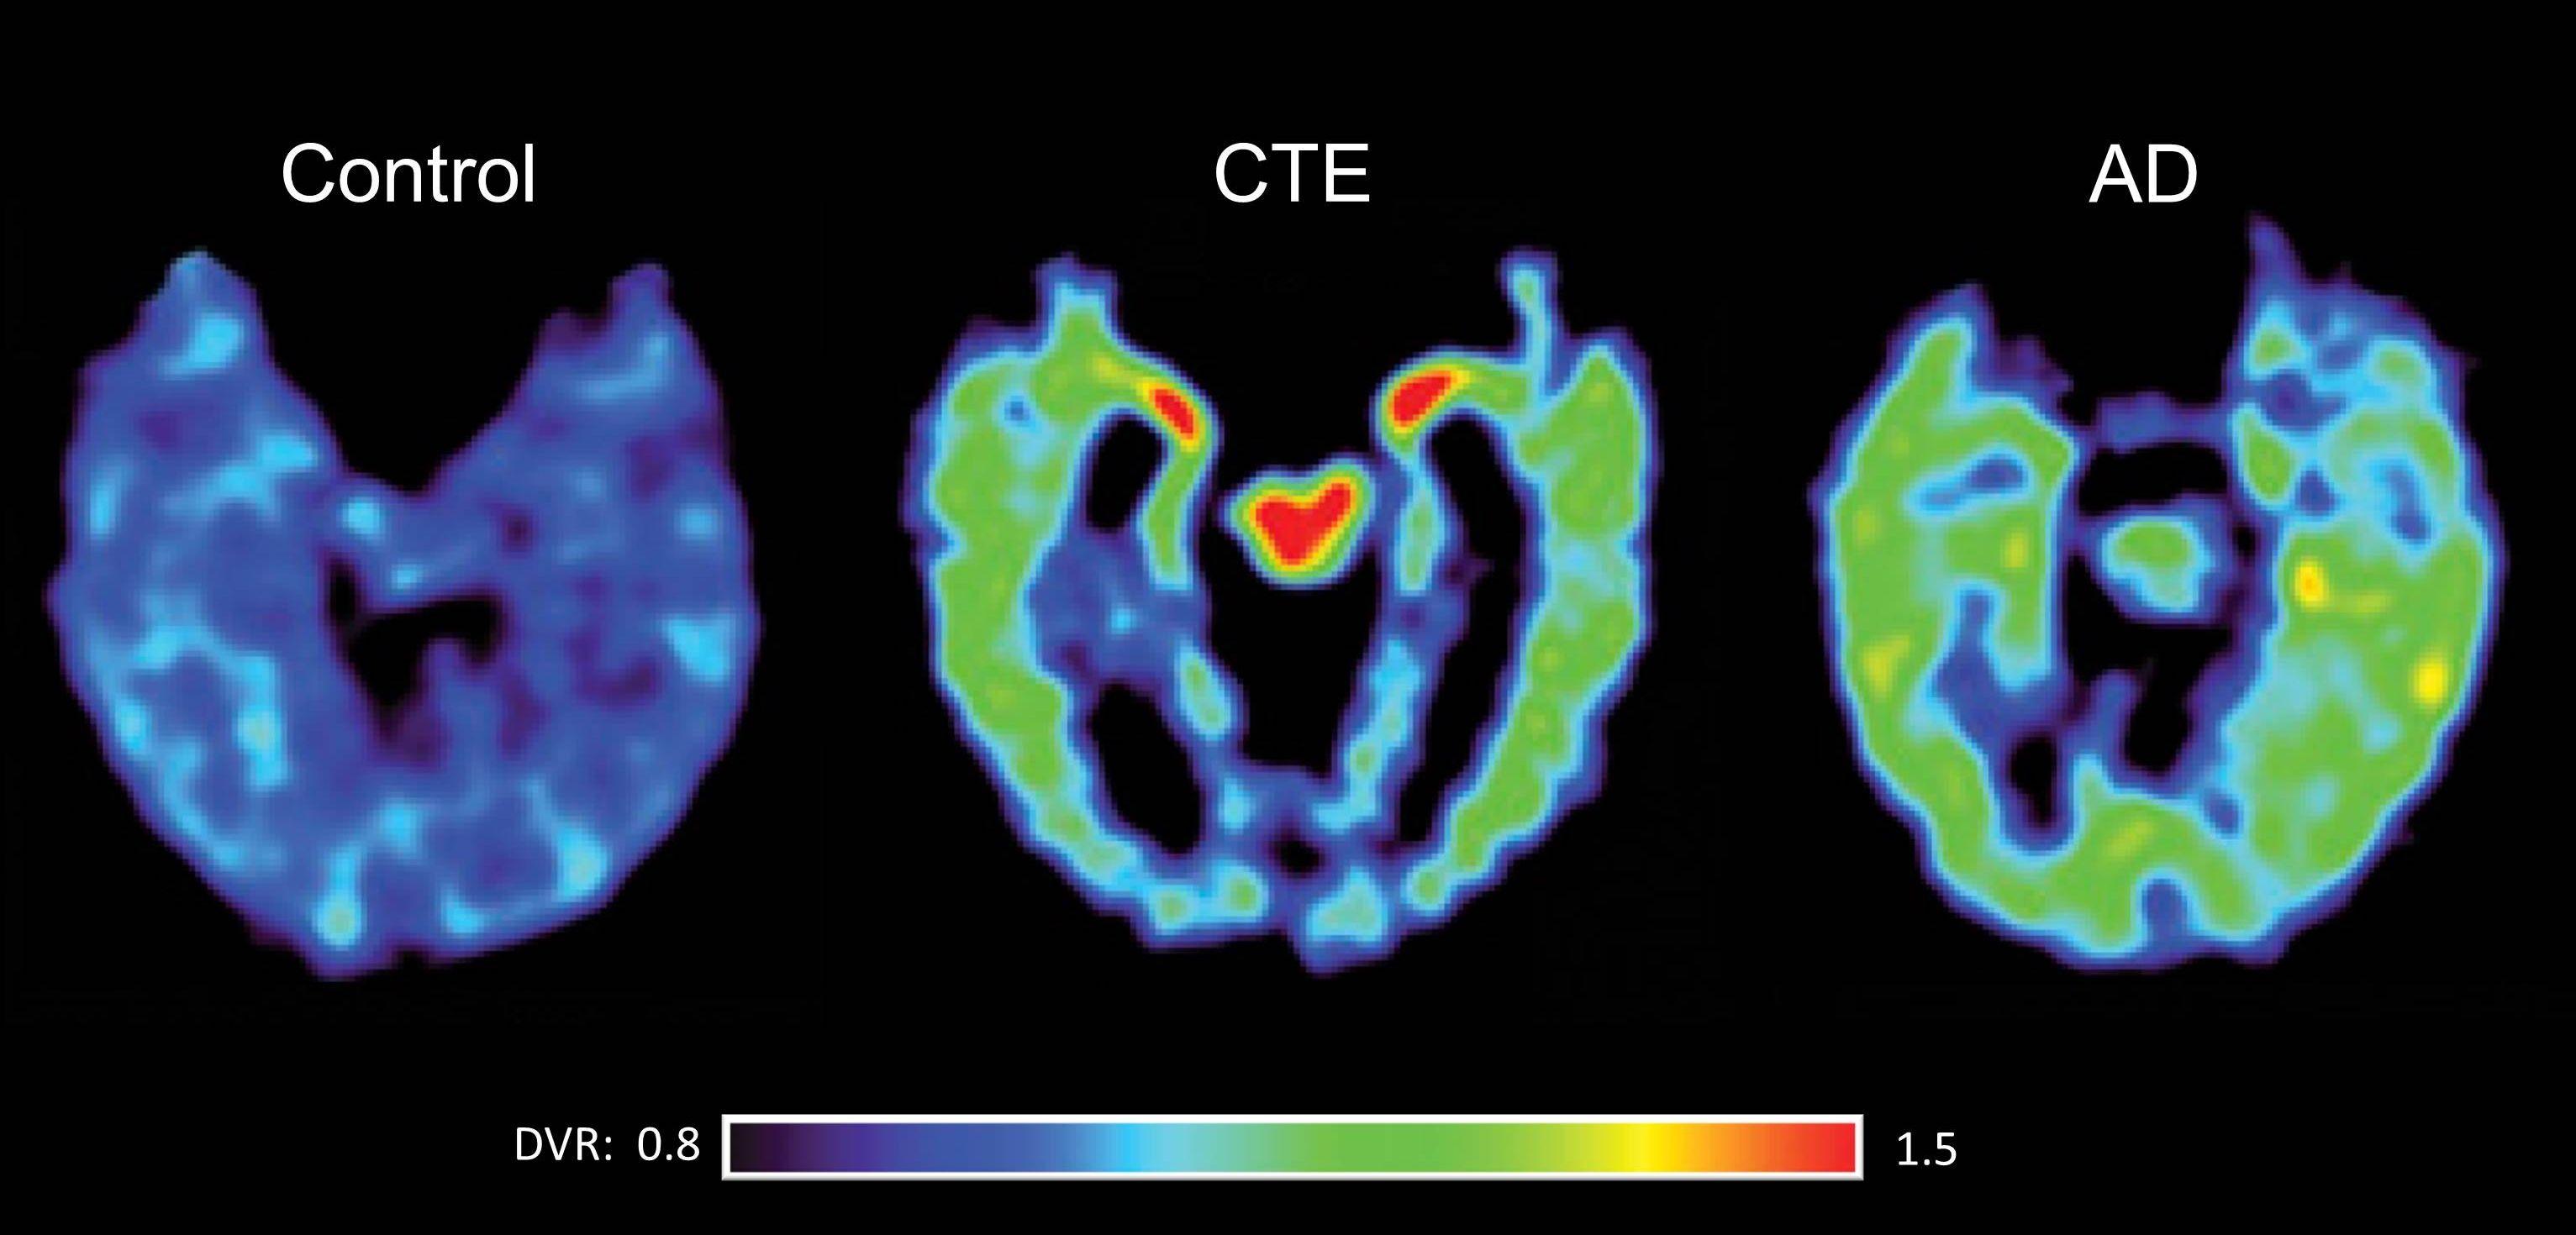 Brain Imaging Tackling Chronic Traumatic Encephalopathy Cte